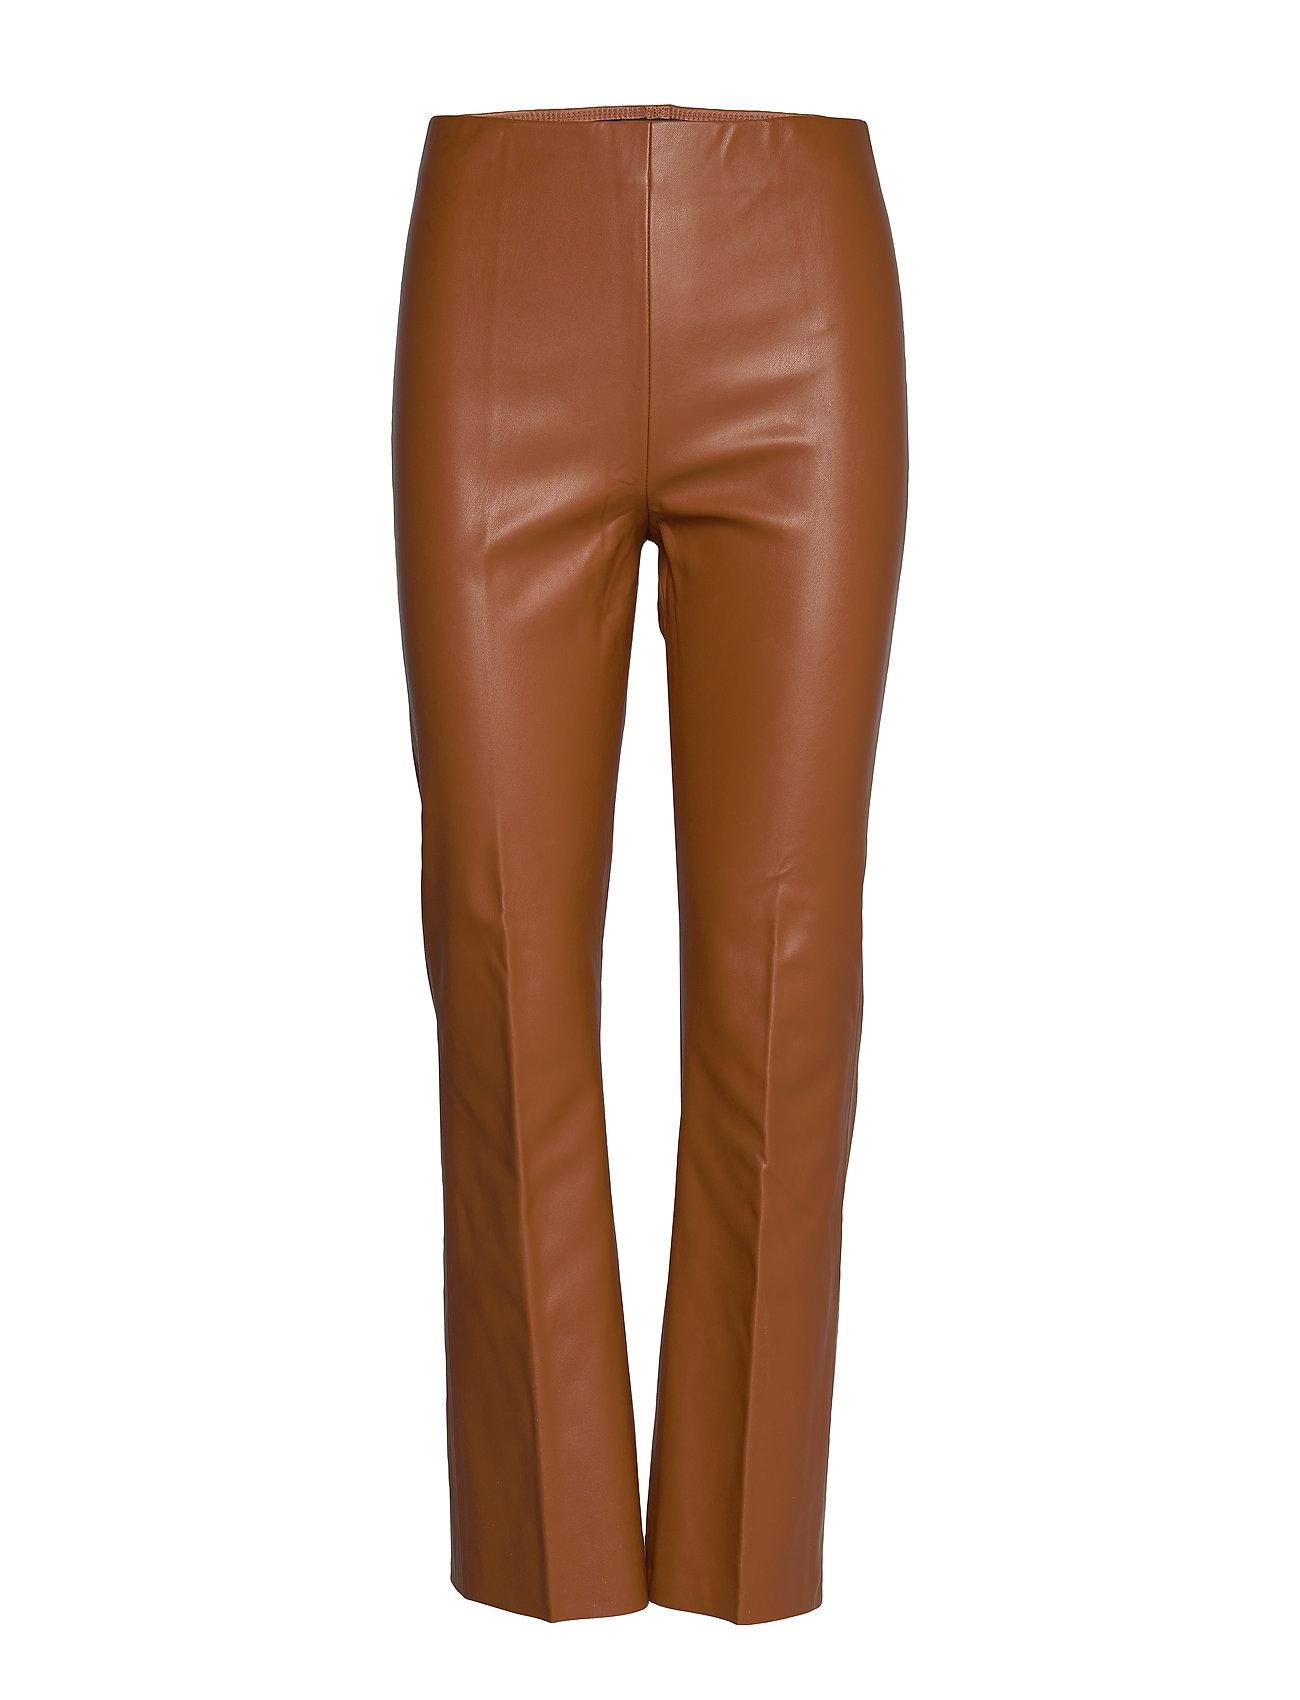 Soaked in Luxury SLKaylee PU Kickflare Pants - MOCHA BISQUE